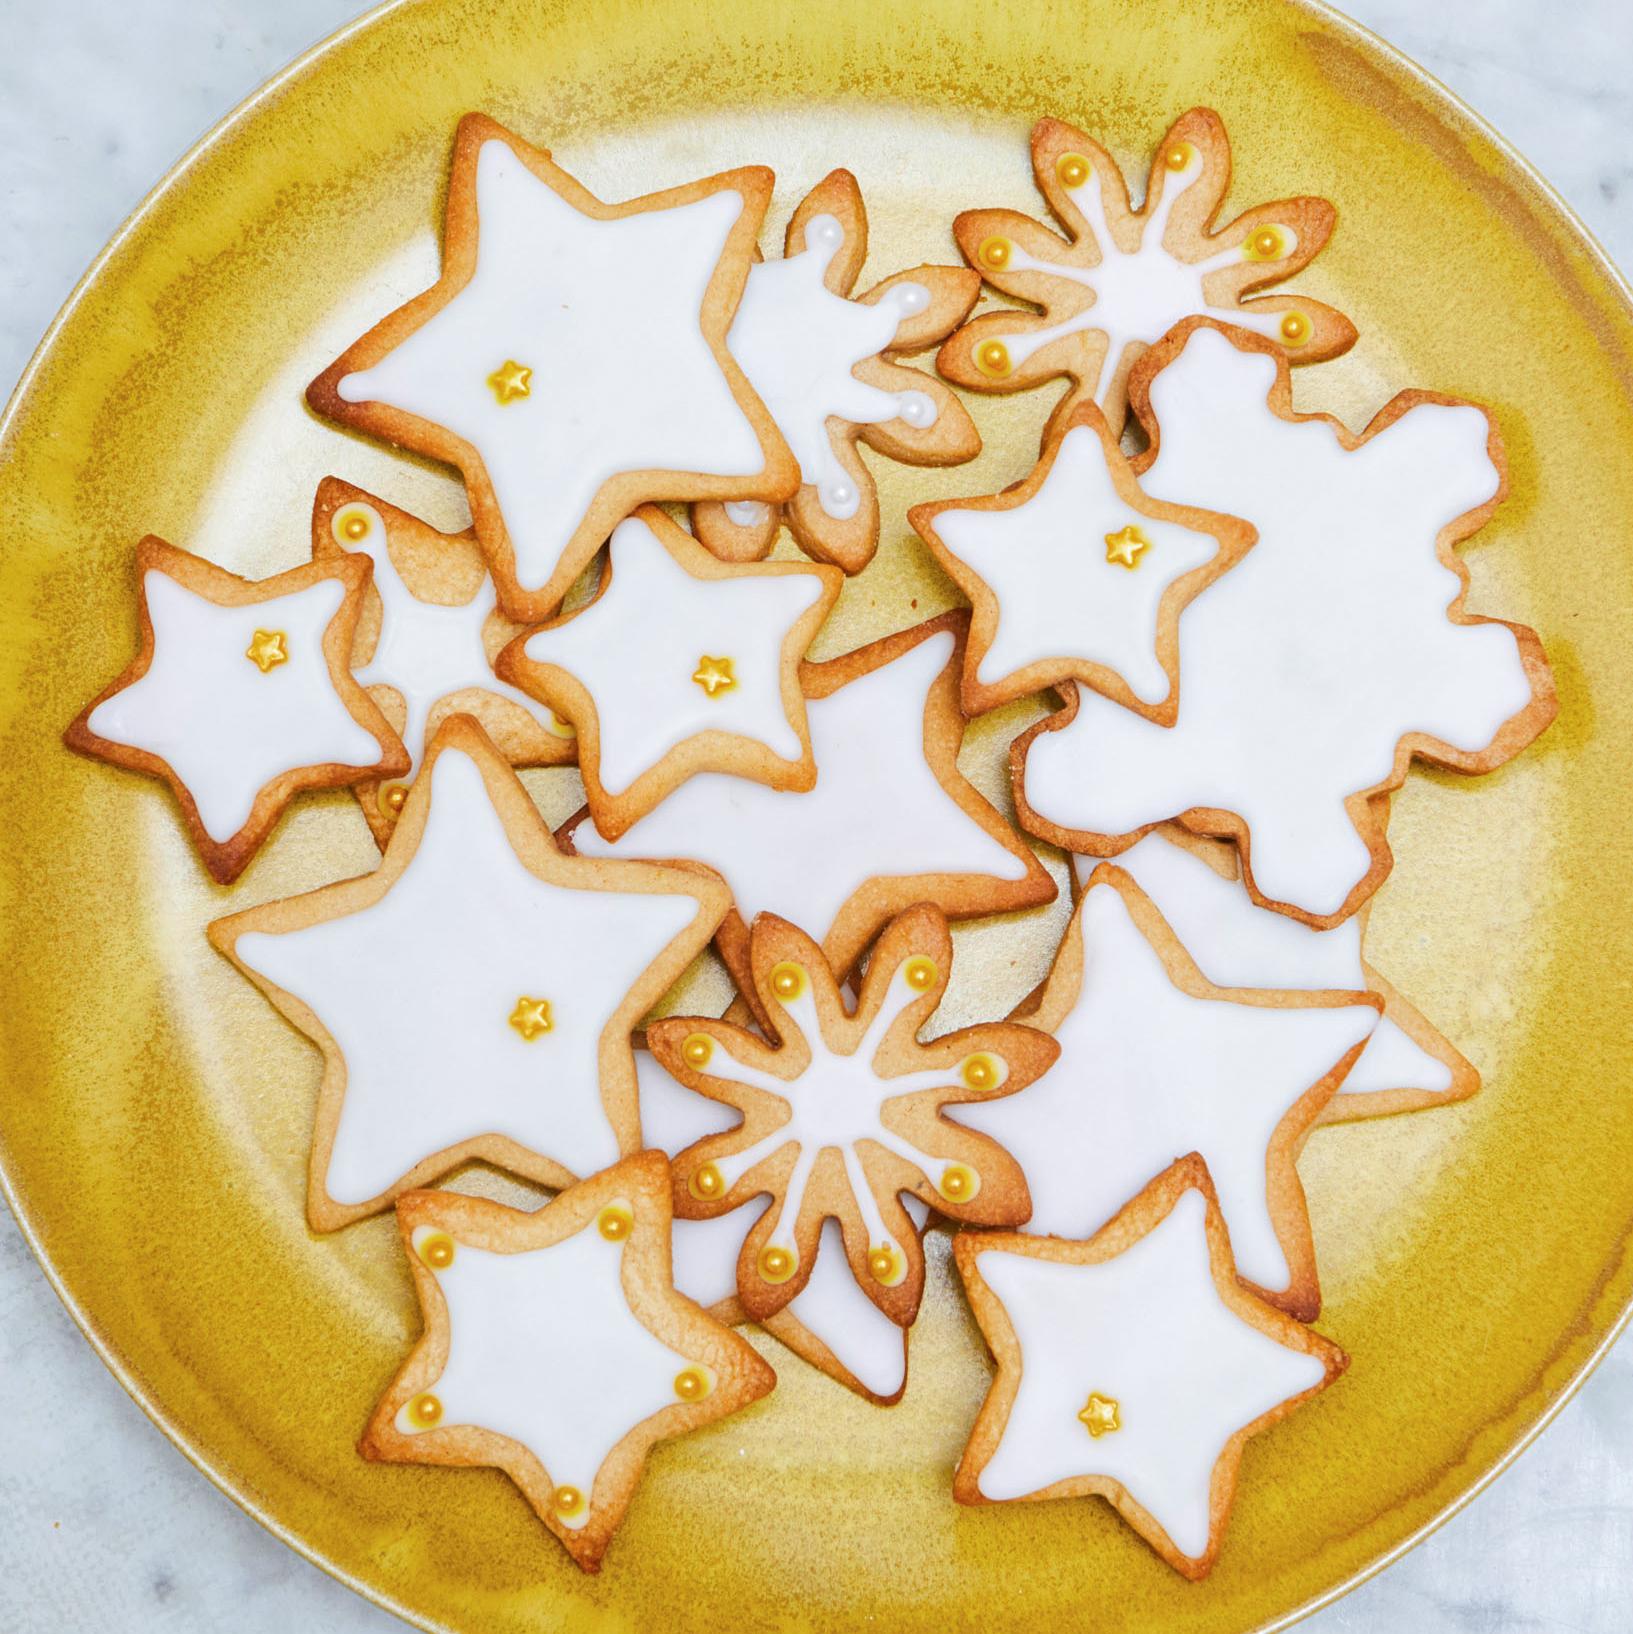 Spiced Stars with Lemon Glaze